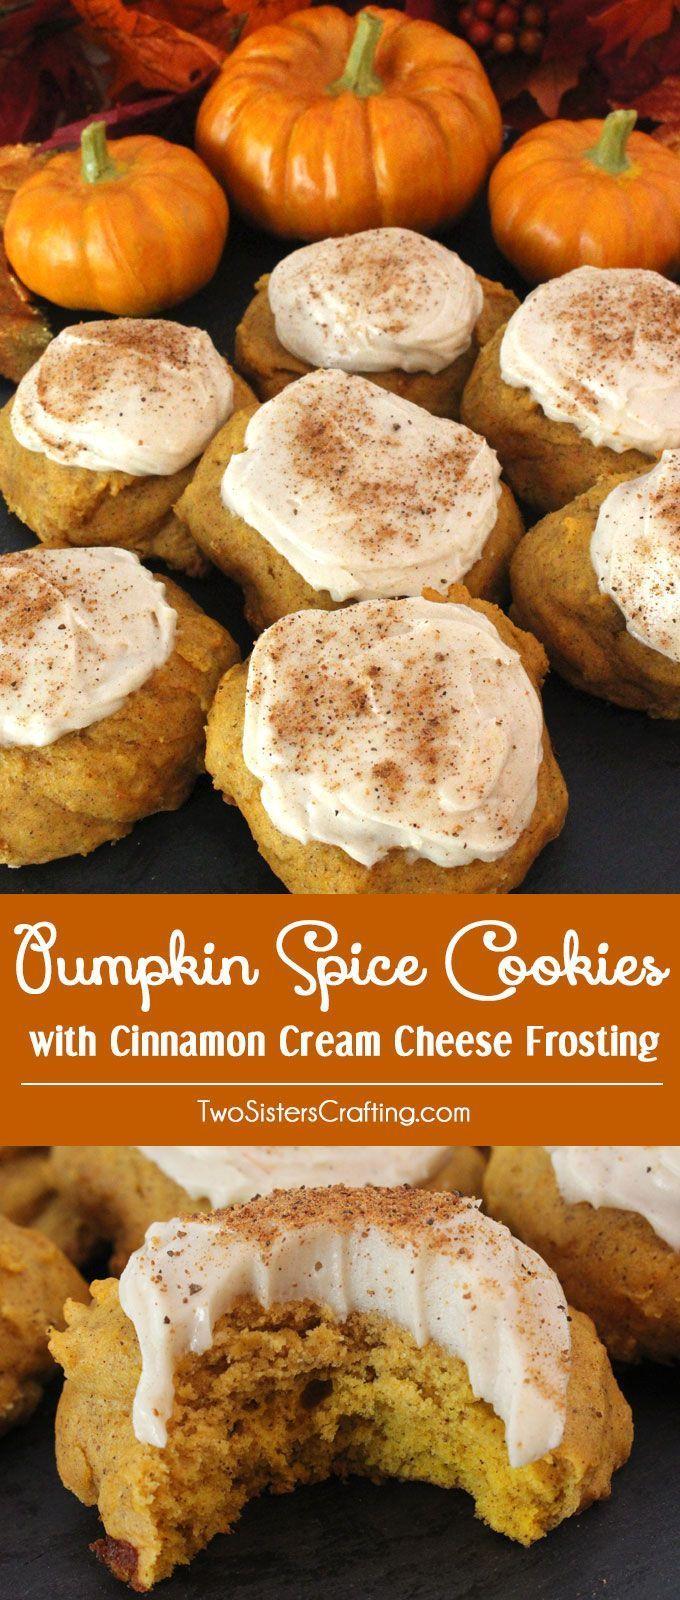 Pumpkin Spice Cookies met Cinnamon Cream Cheese Frosting,  #Cheese #Cinnamon #Cookies #Cream …